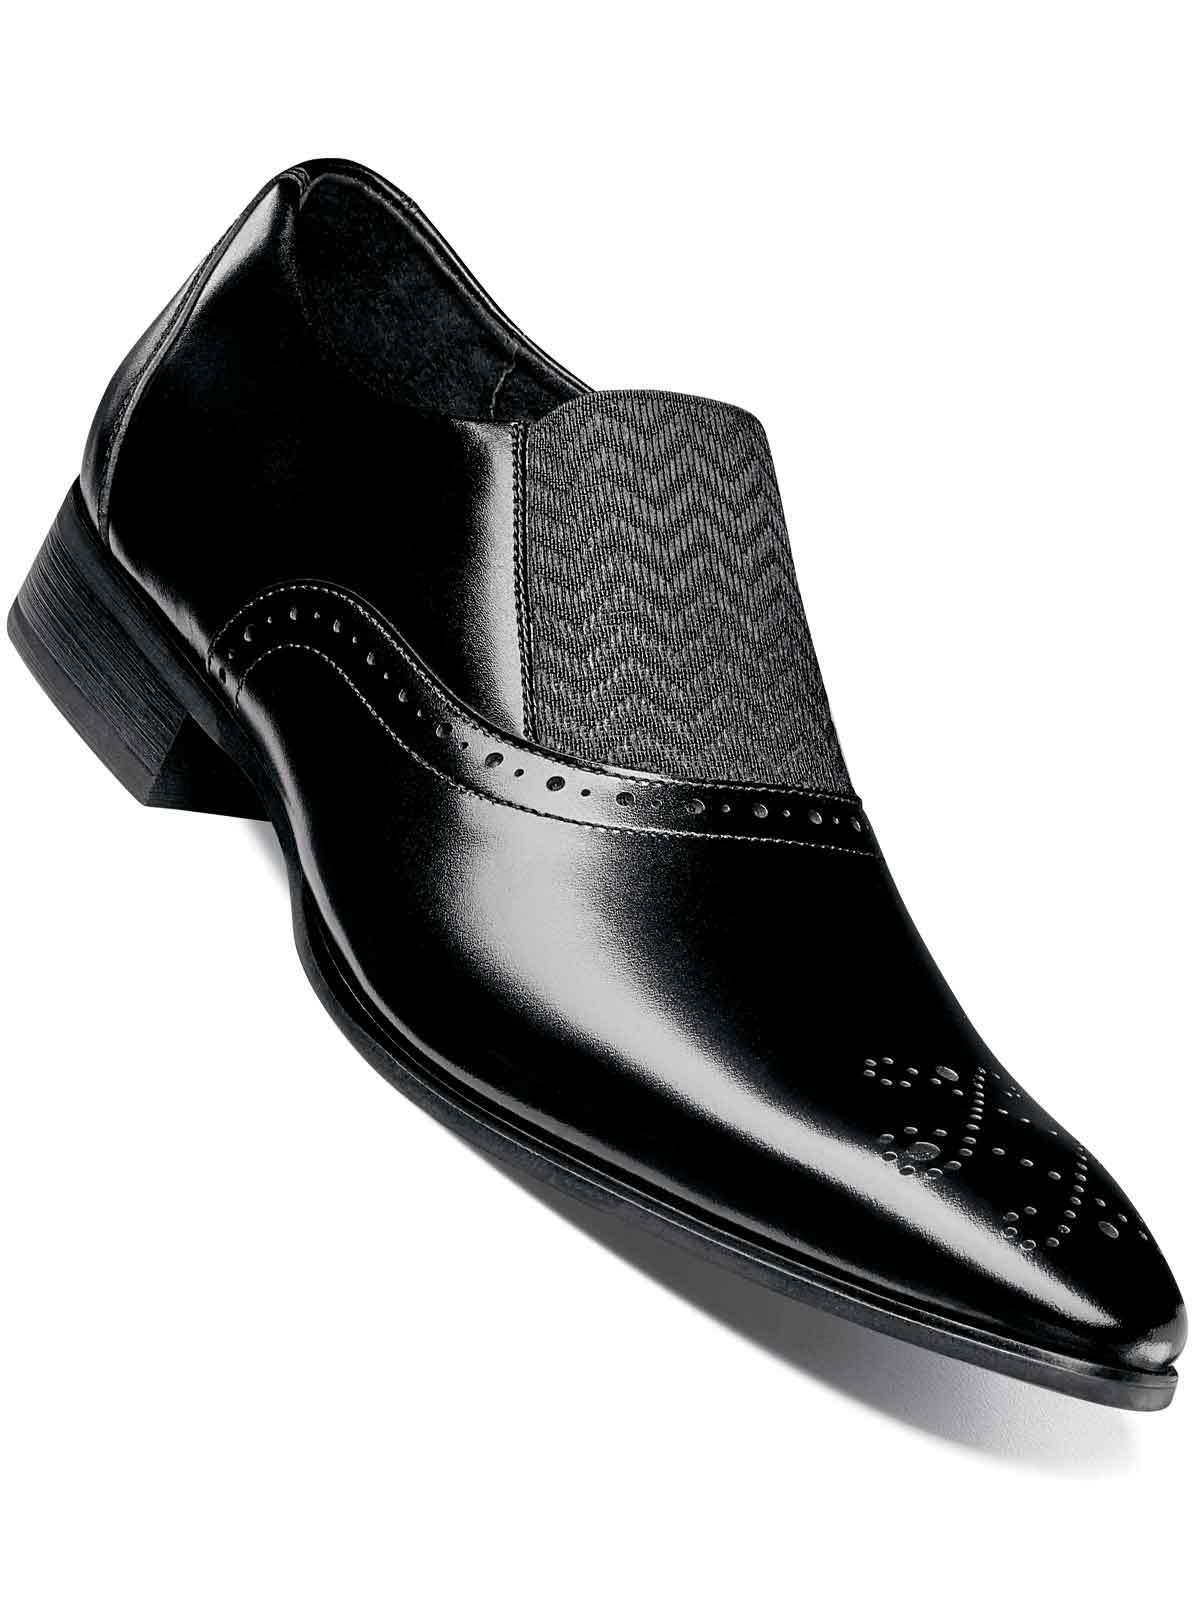 Stacy Adams Mens Black Genuine Leather Valerian Brogue Men Slip-ons Dress shoes